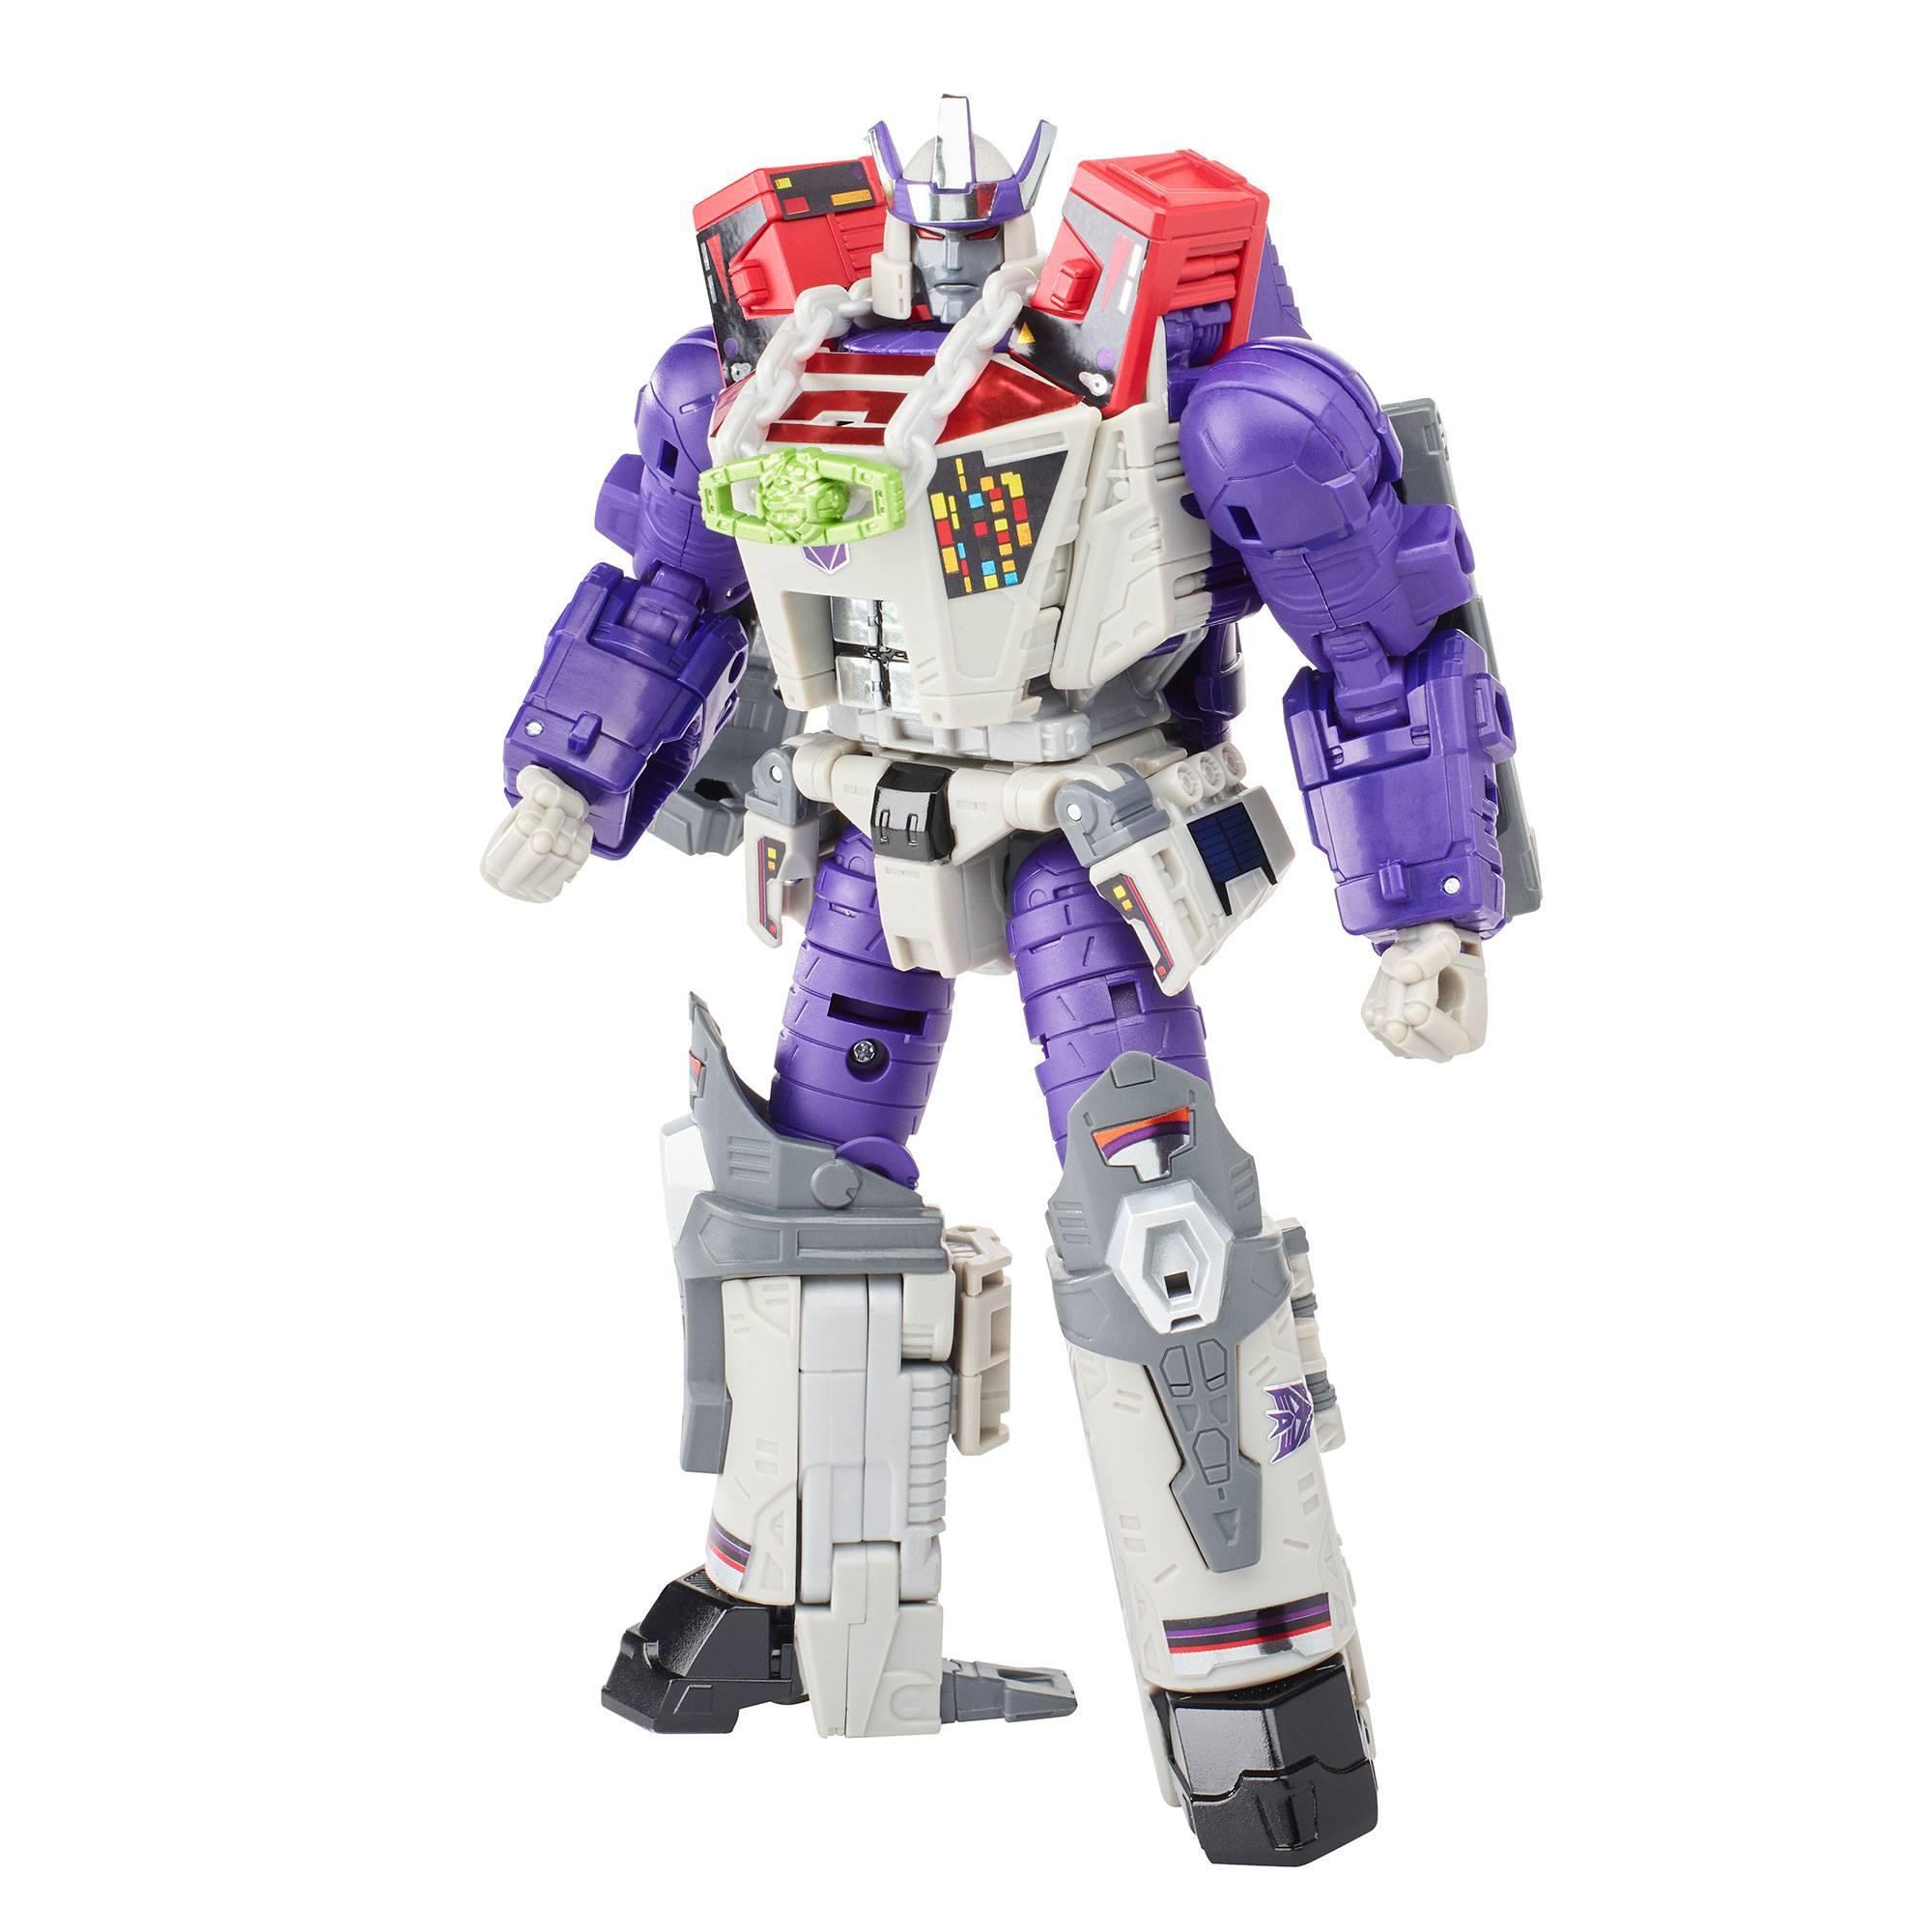 Transformers Generations War For Cybertron Trilogy Leader Class Actionfigur 2021 Galvatron 18 cm HASF1809 5010993897452